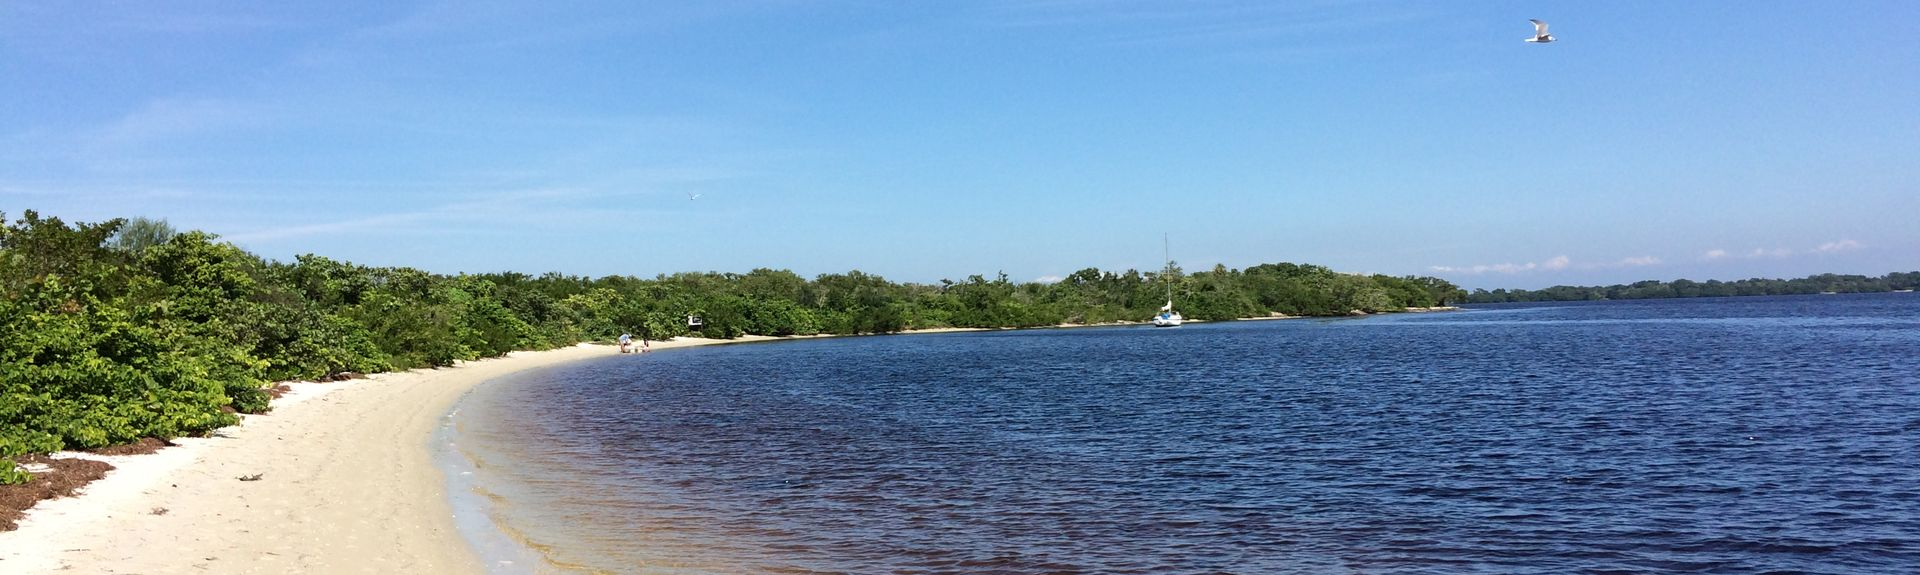 Shorewalk Vacation Villas, Bradenton, Florida, United States of America